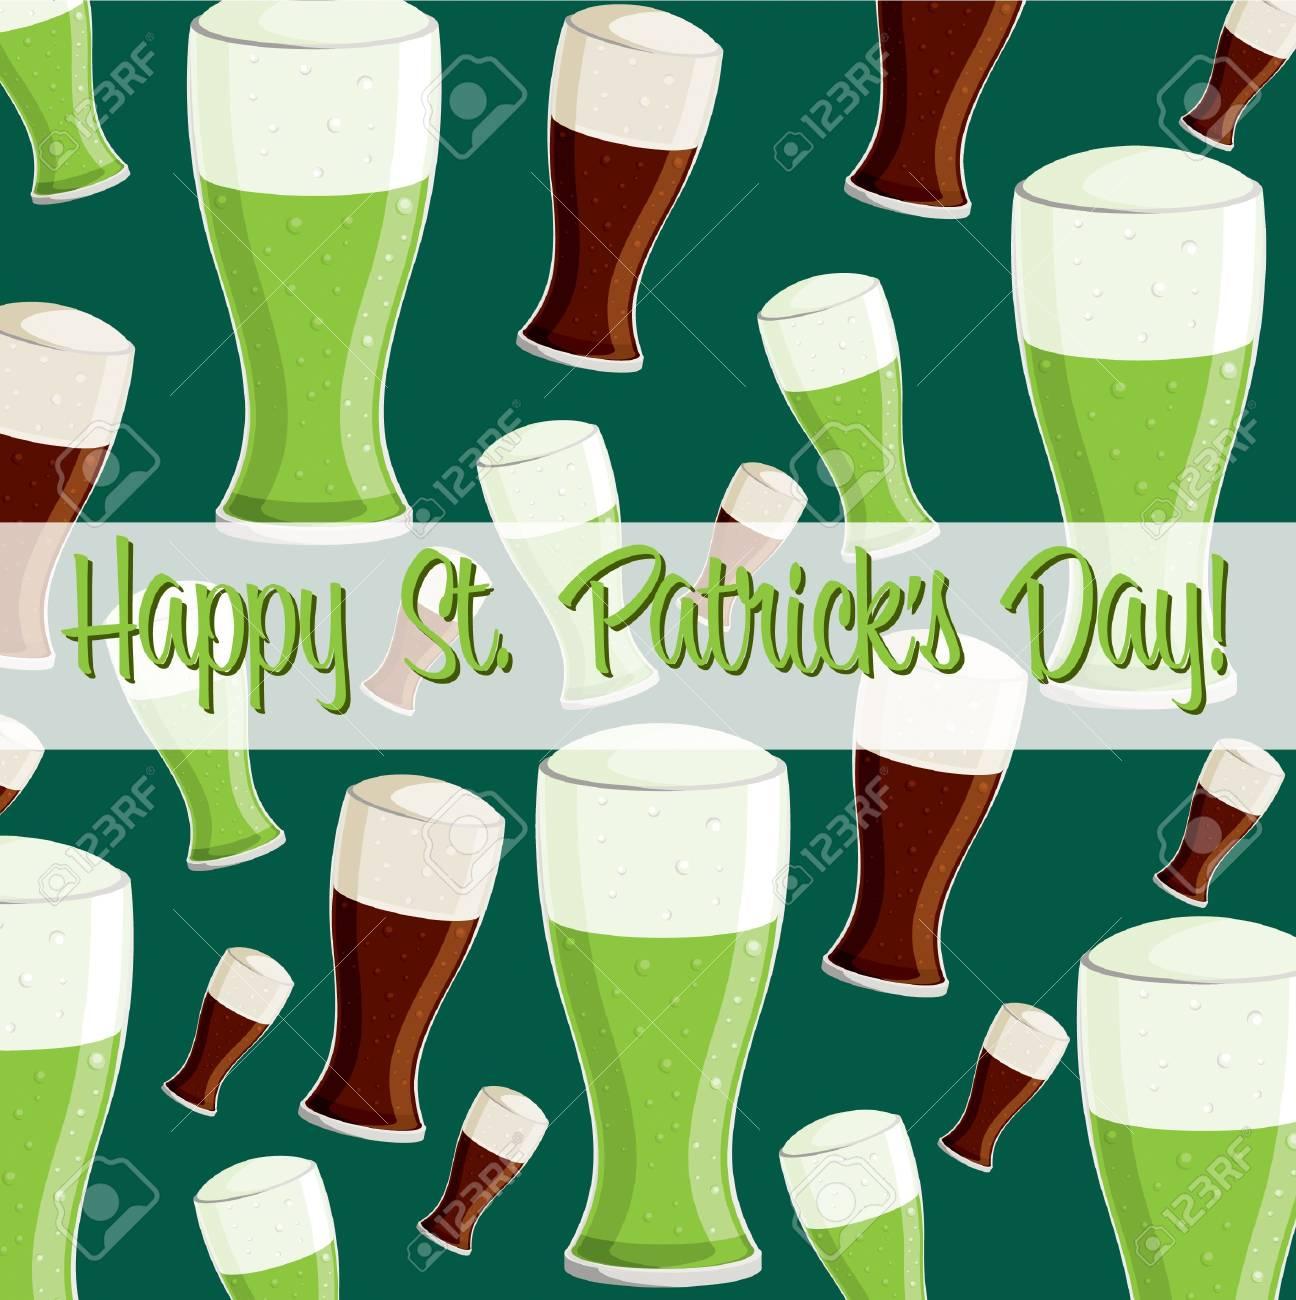 Happy St  Patrick s Day  beer card in vector format Stock Vector - 19644695